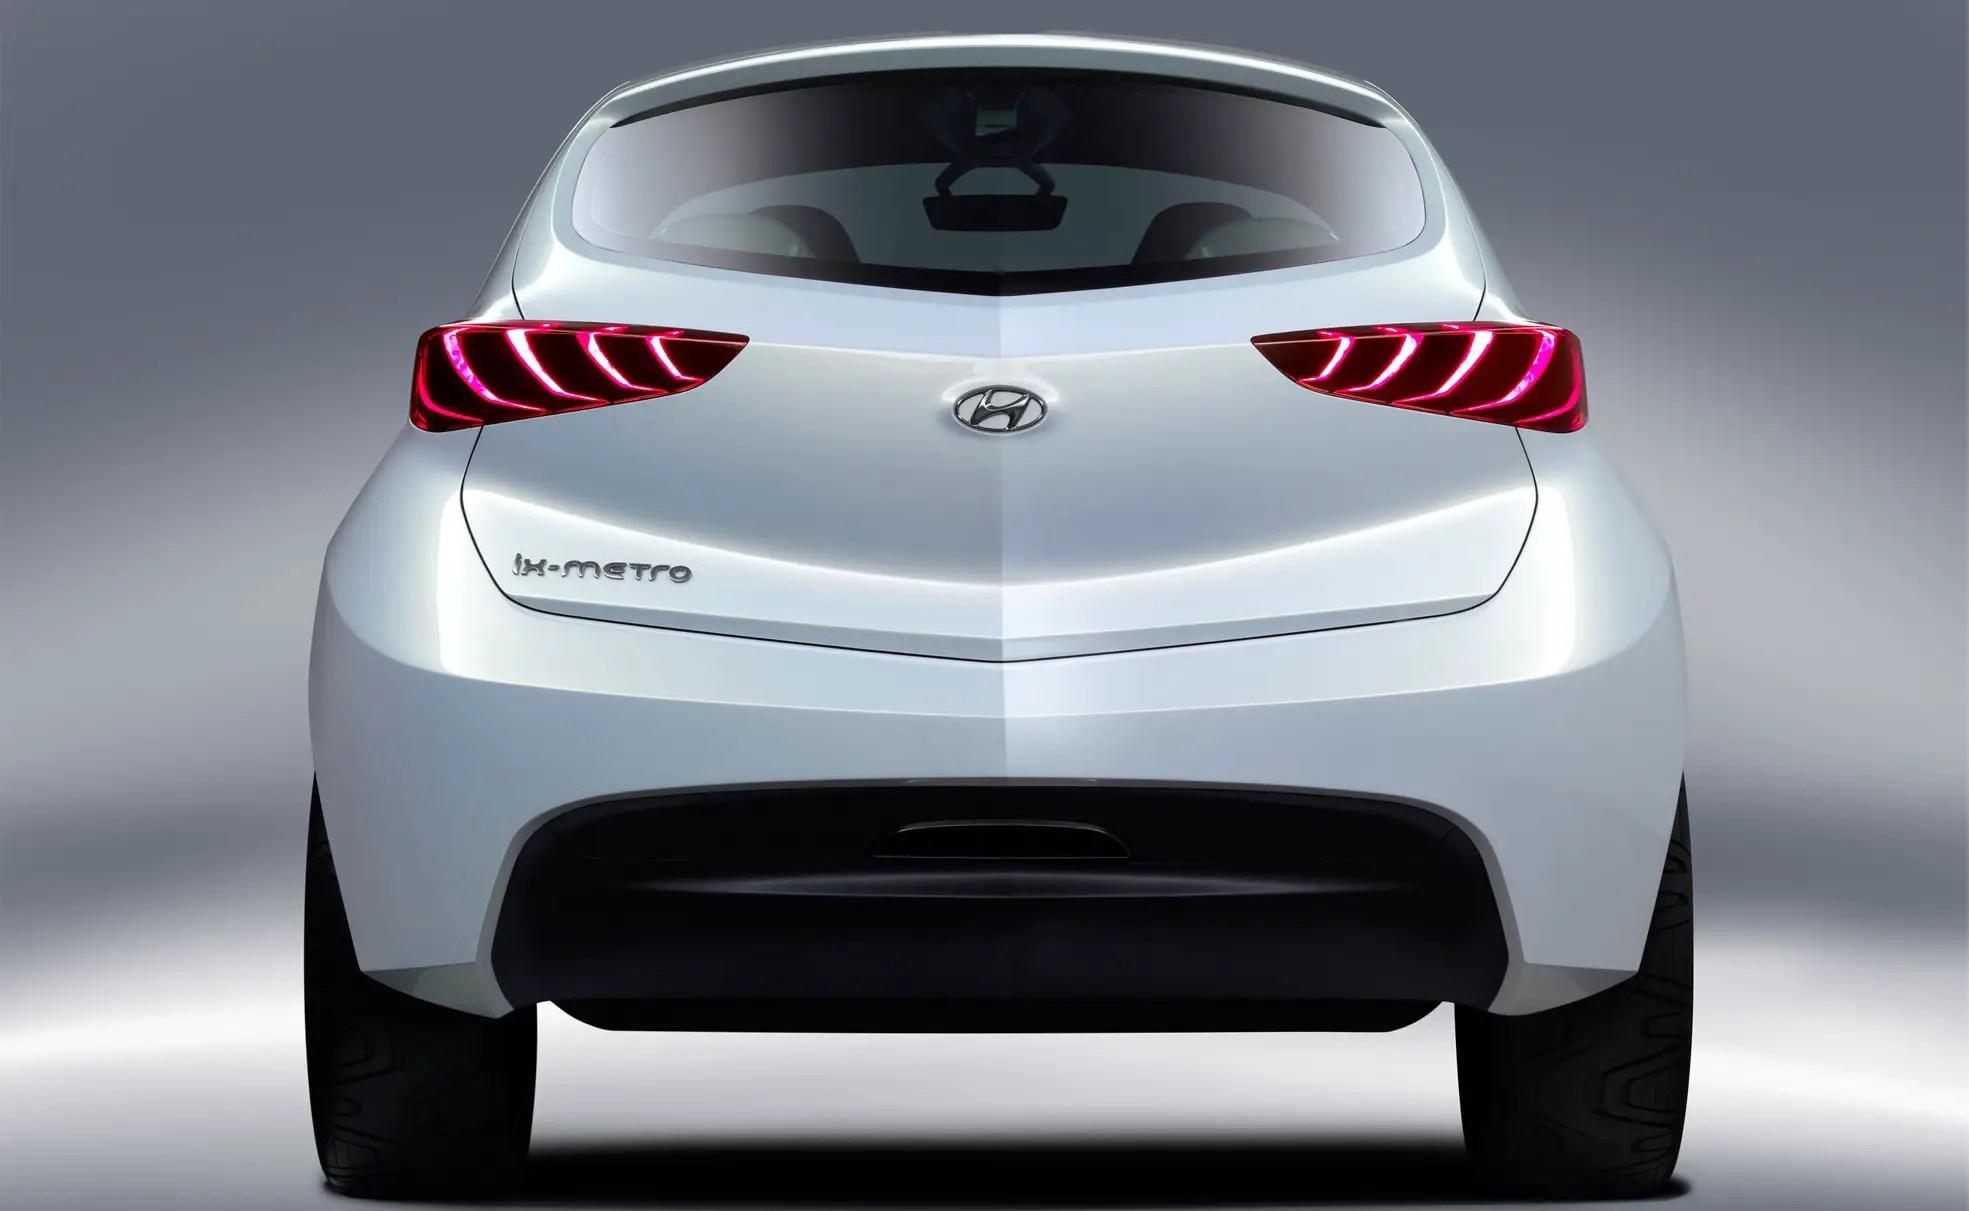 2020 Hyundai Santro On Road Price